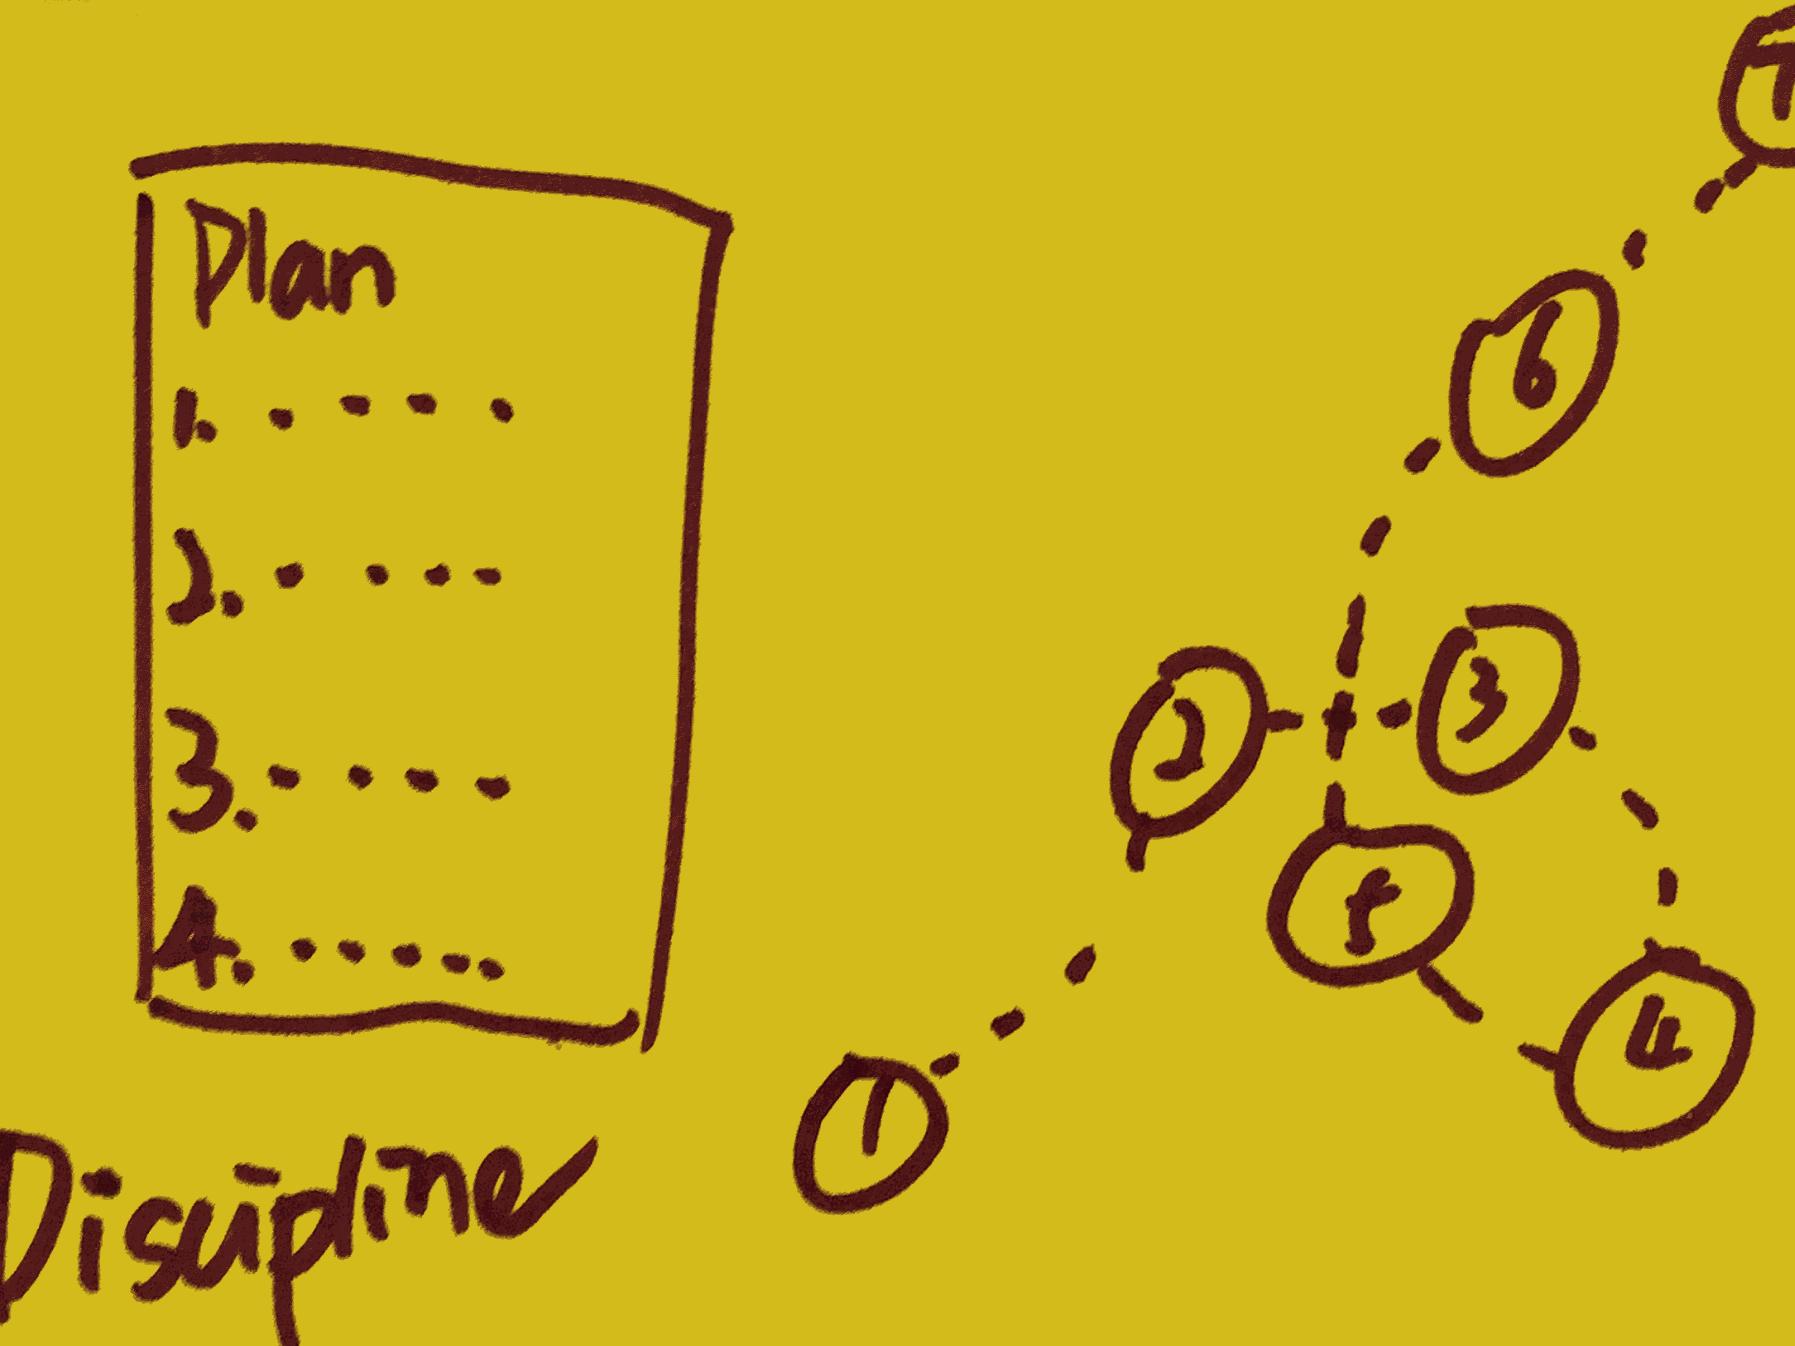 Discipline Step by Step Tasks